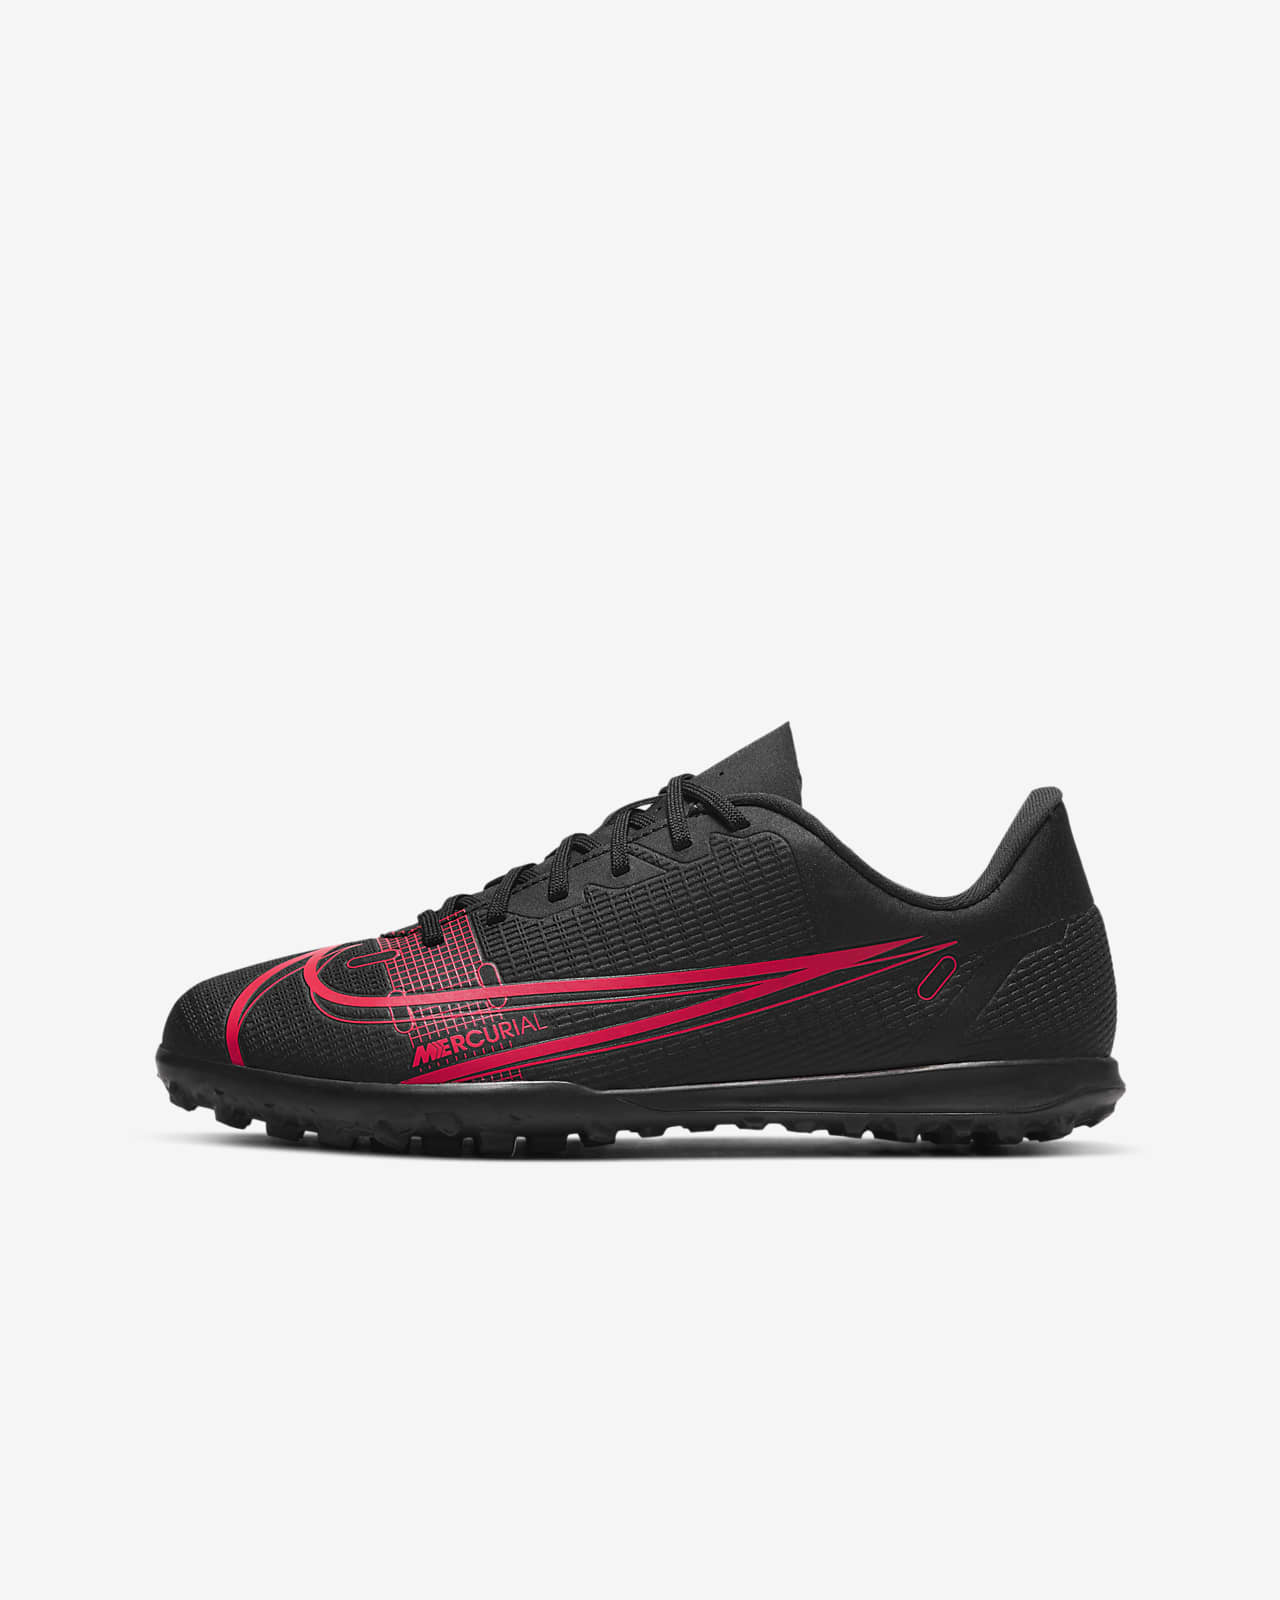 Scarpa da calcio per erba sintetica Nike Jr. Mercurial Vapor 14 Club TF - Bambini/Ragazzi